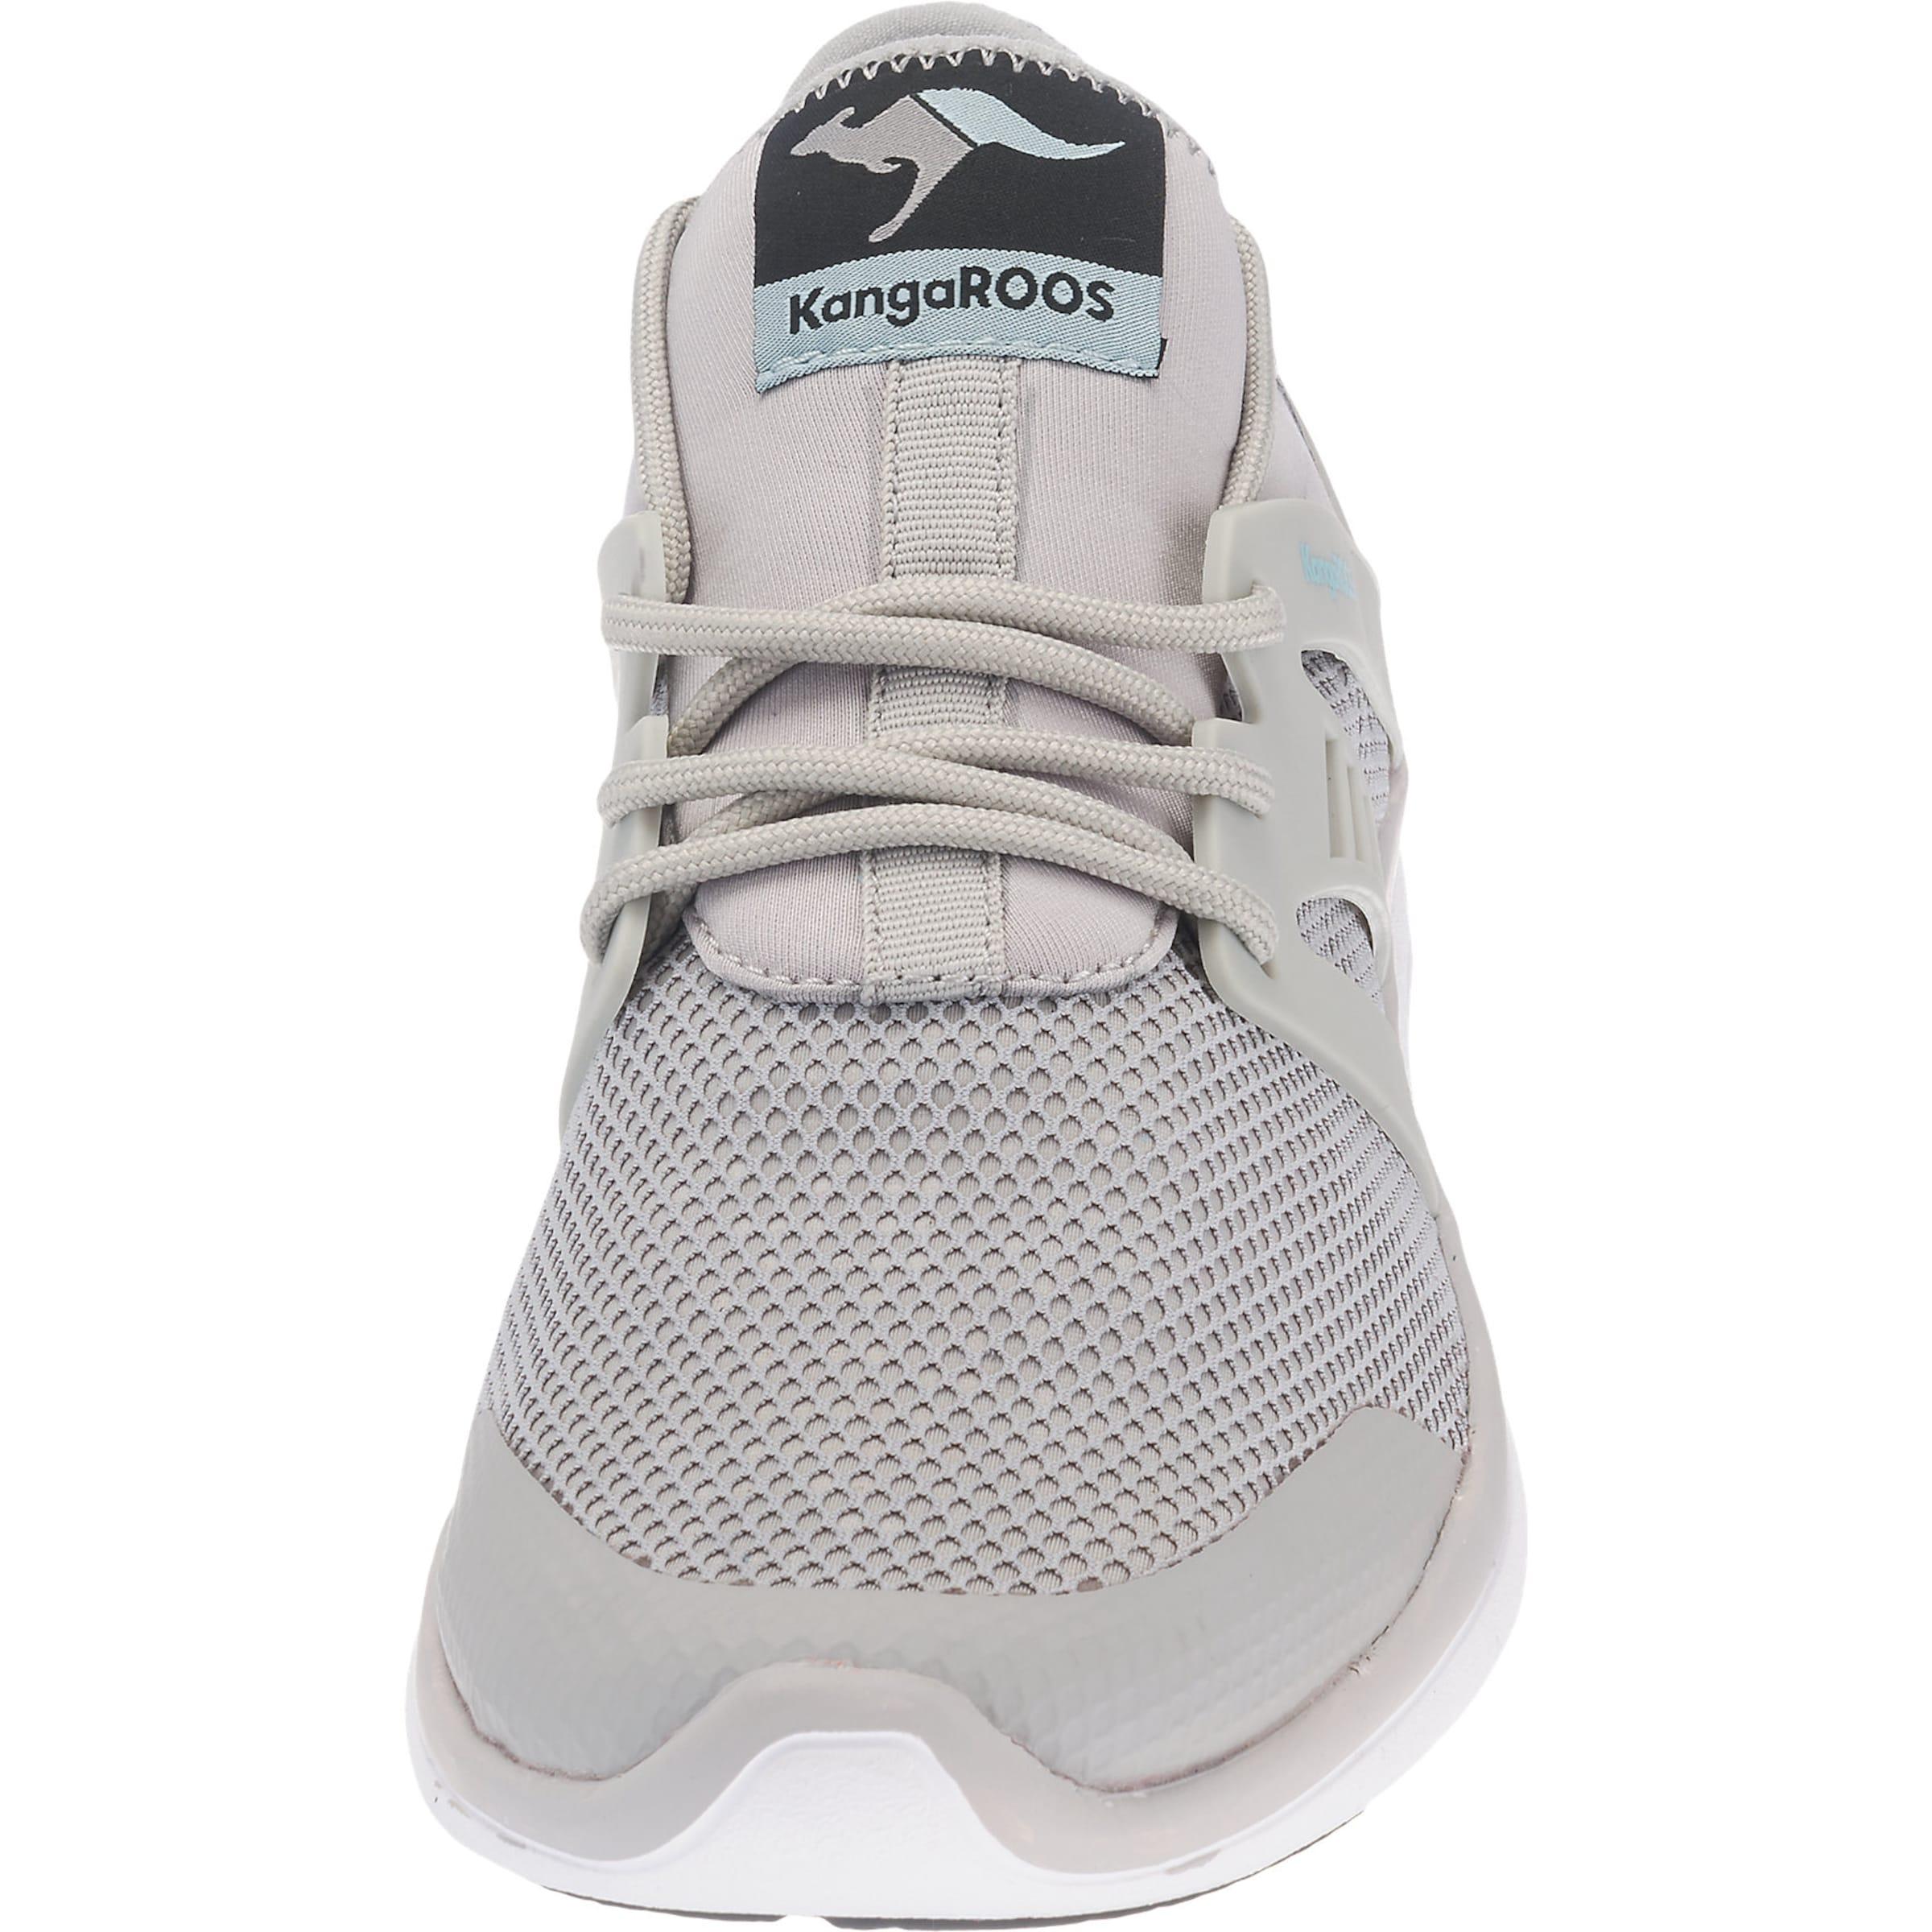 Perfekt KangaROOS Sneakers 'XCAPE' Spielraum Mit Paypal yCmBLlmKAw